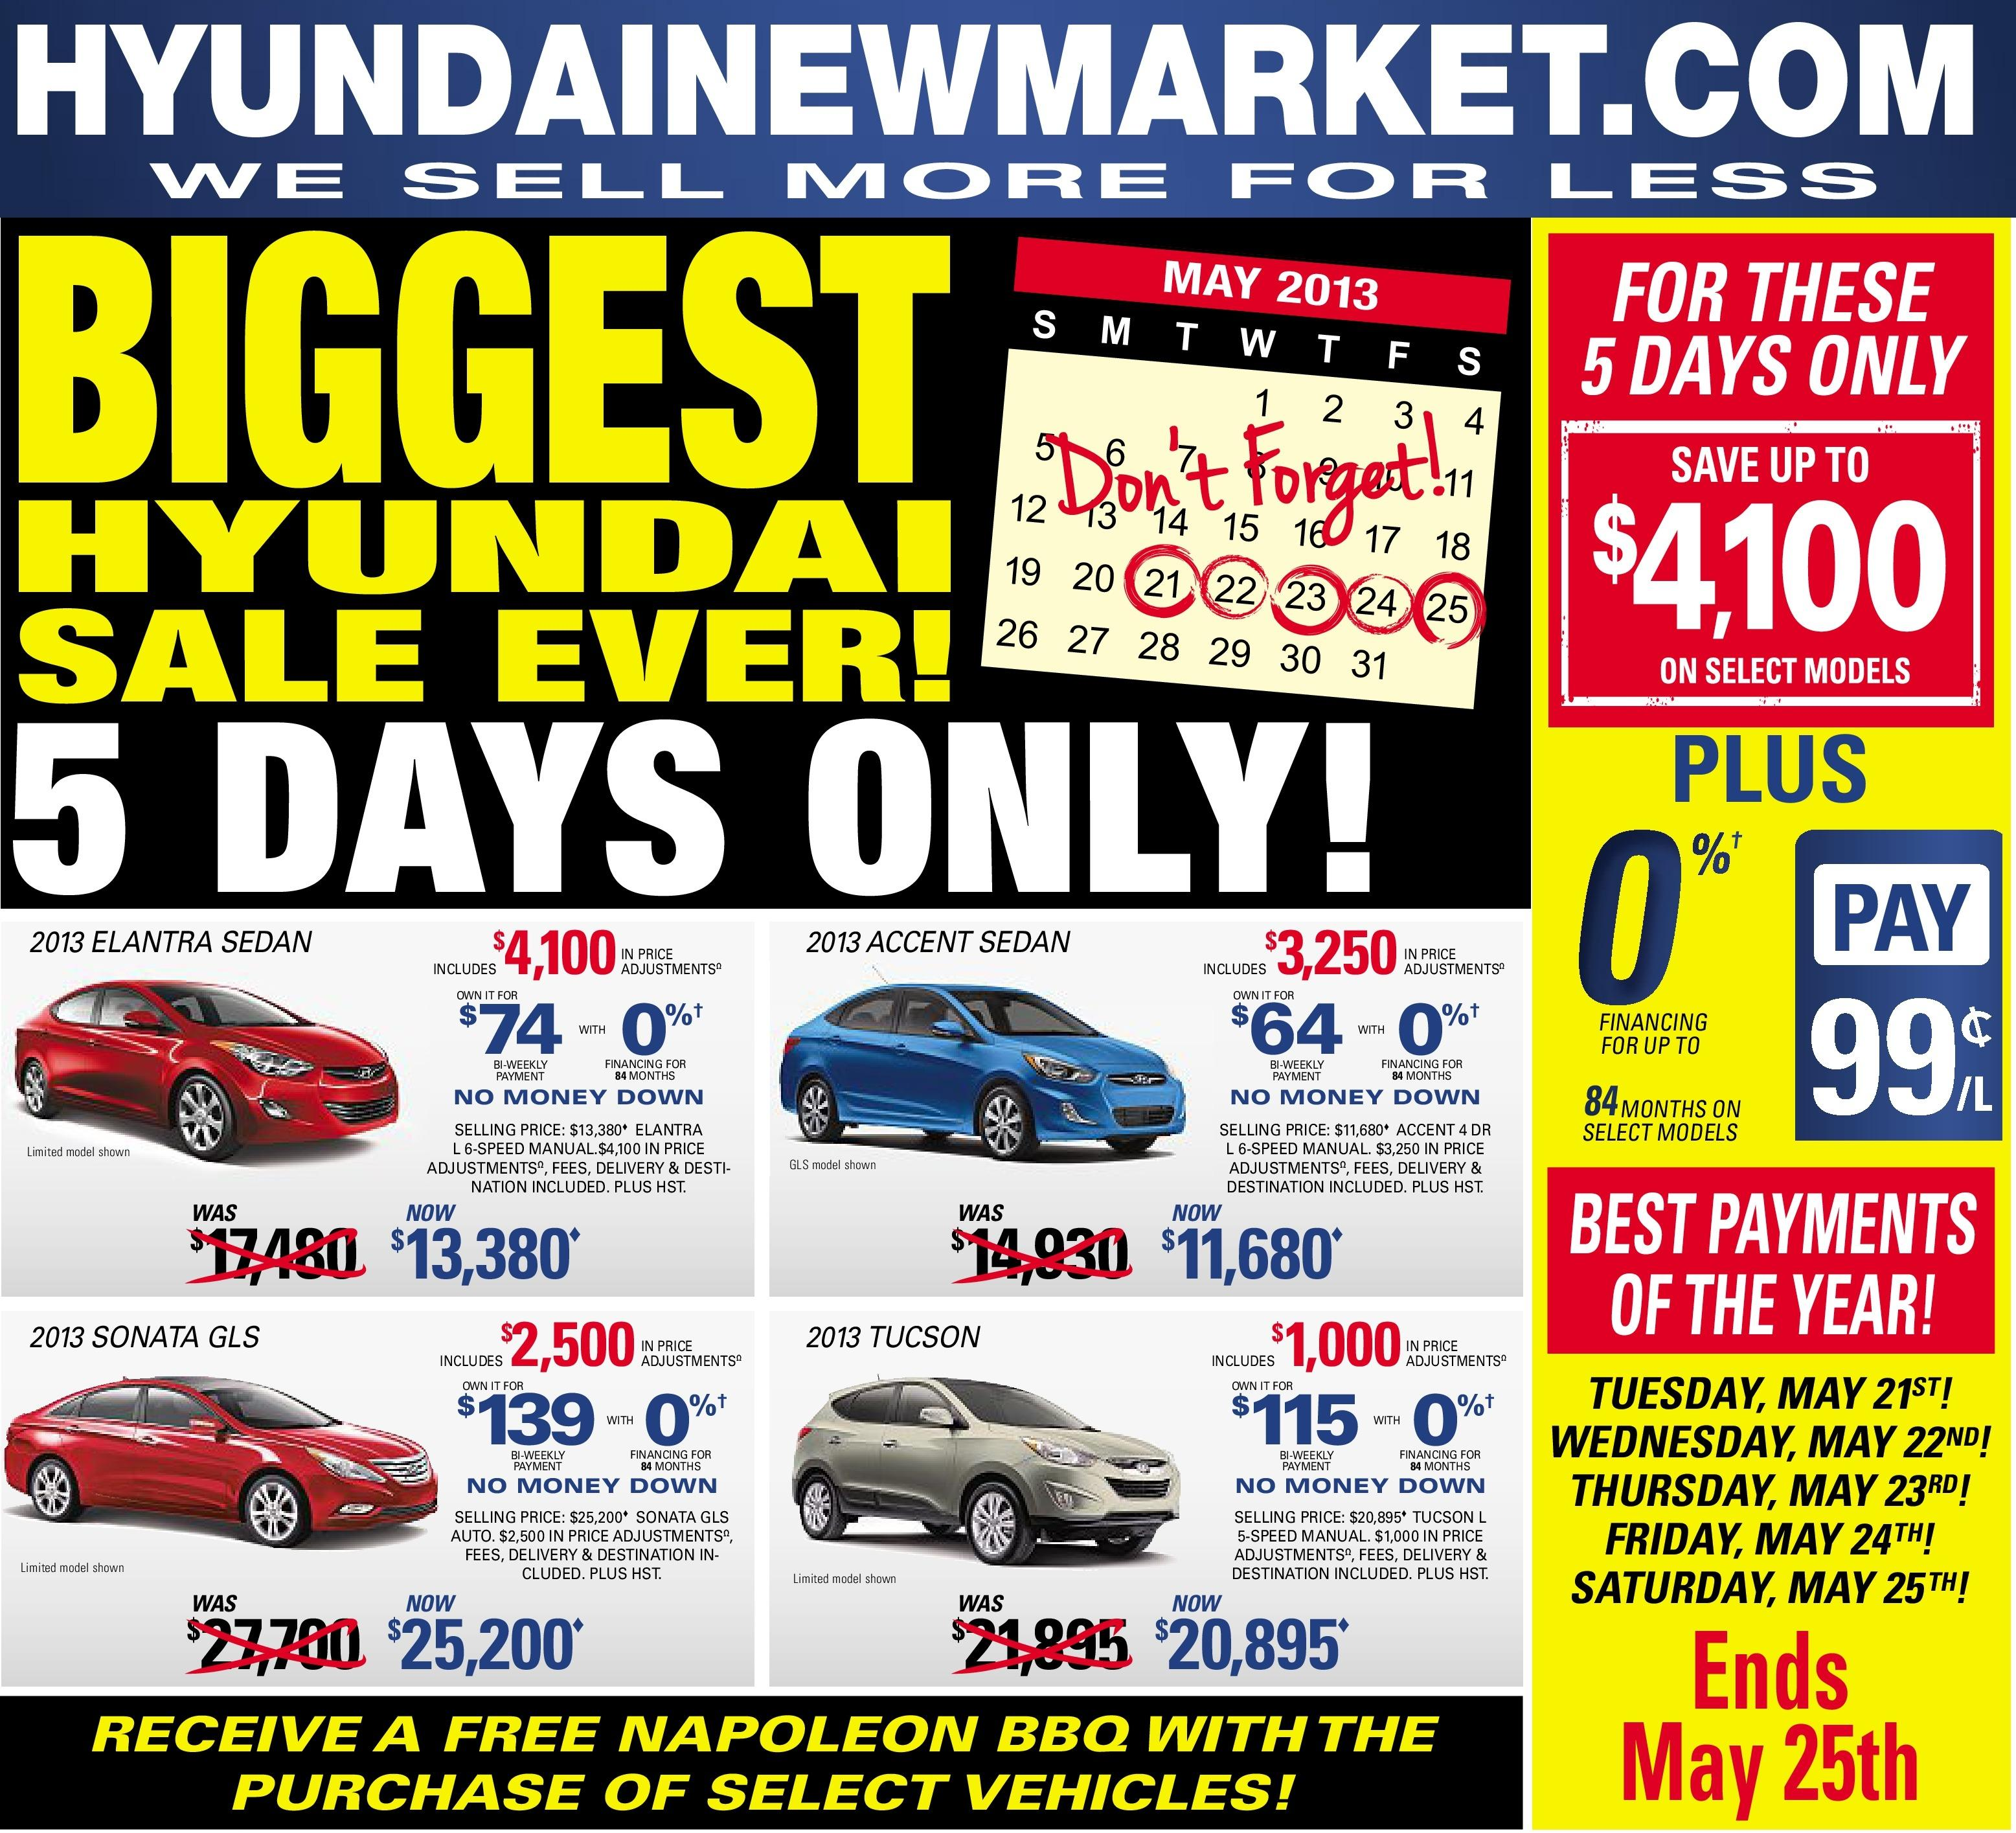 Hyundai Biggest Sale Ever